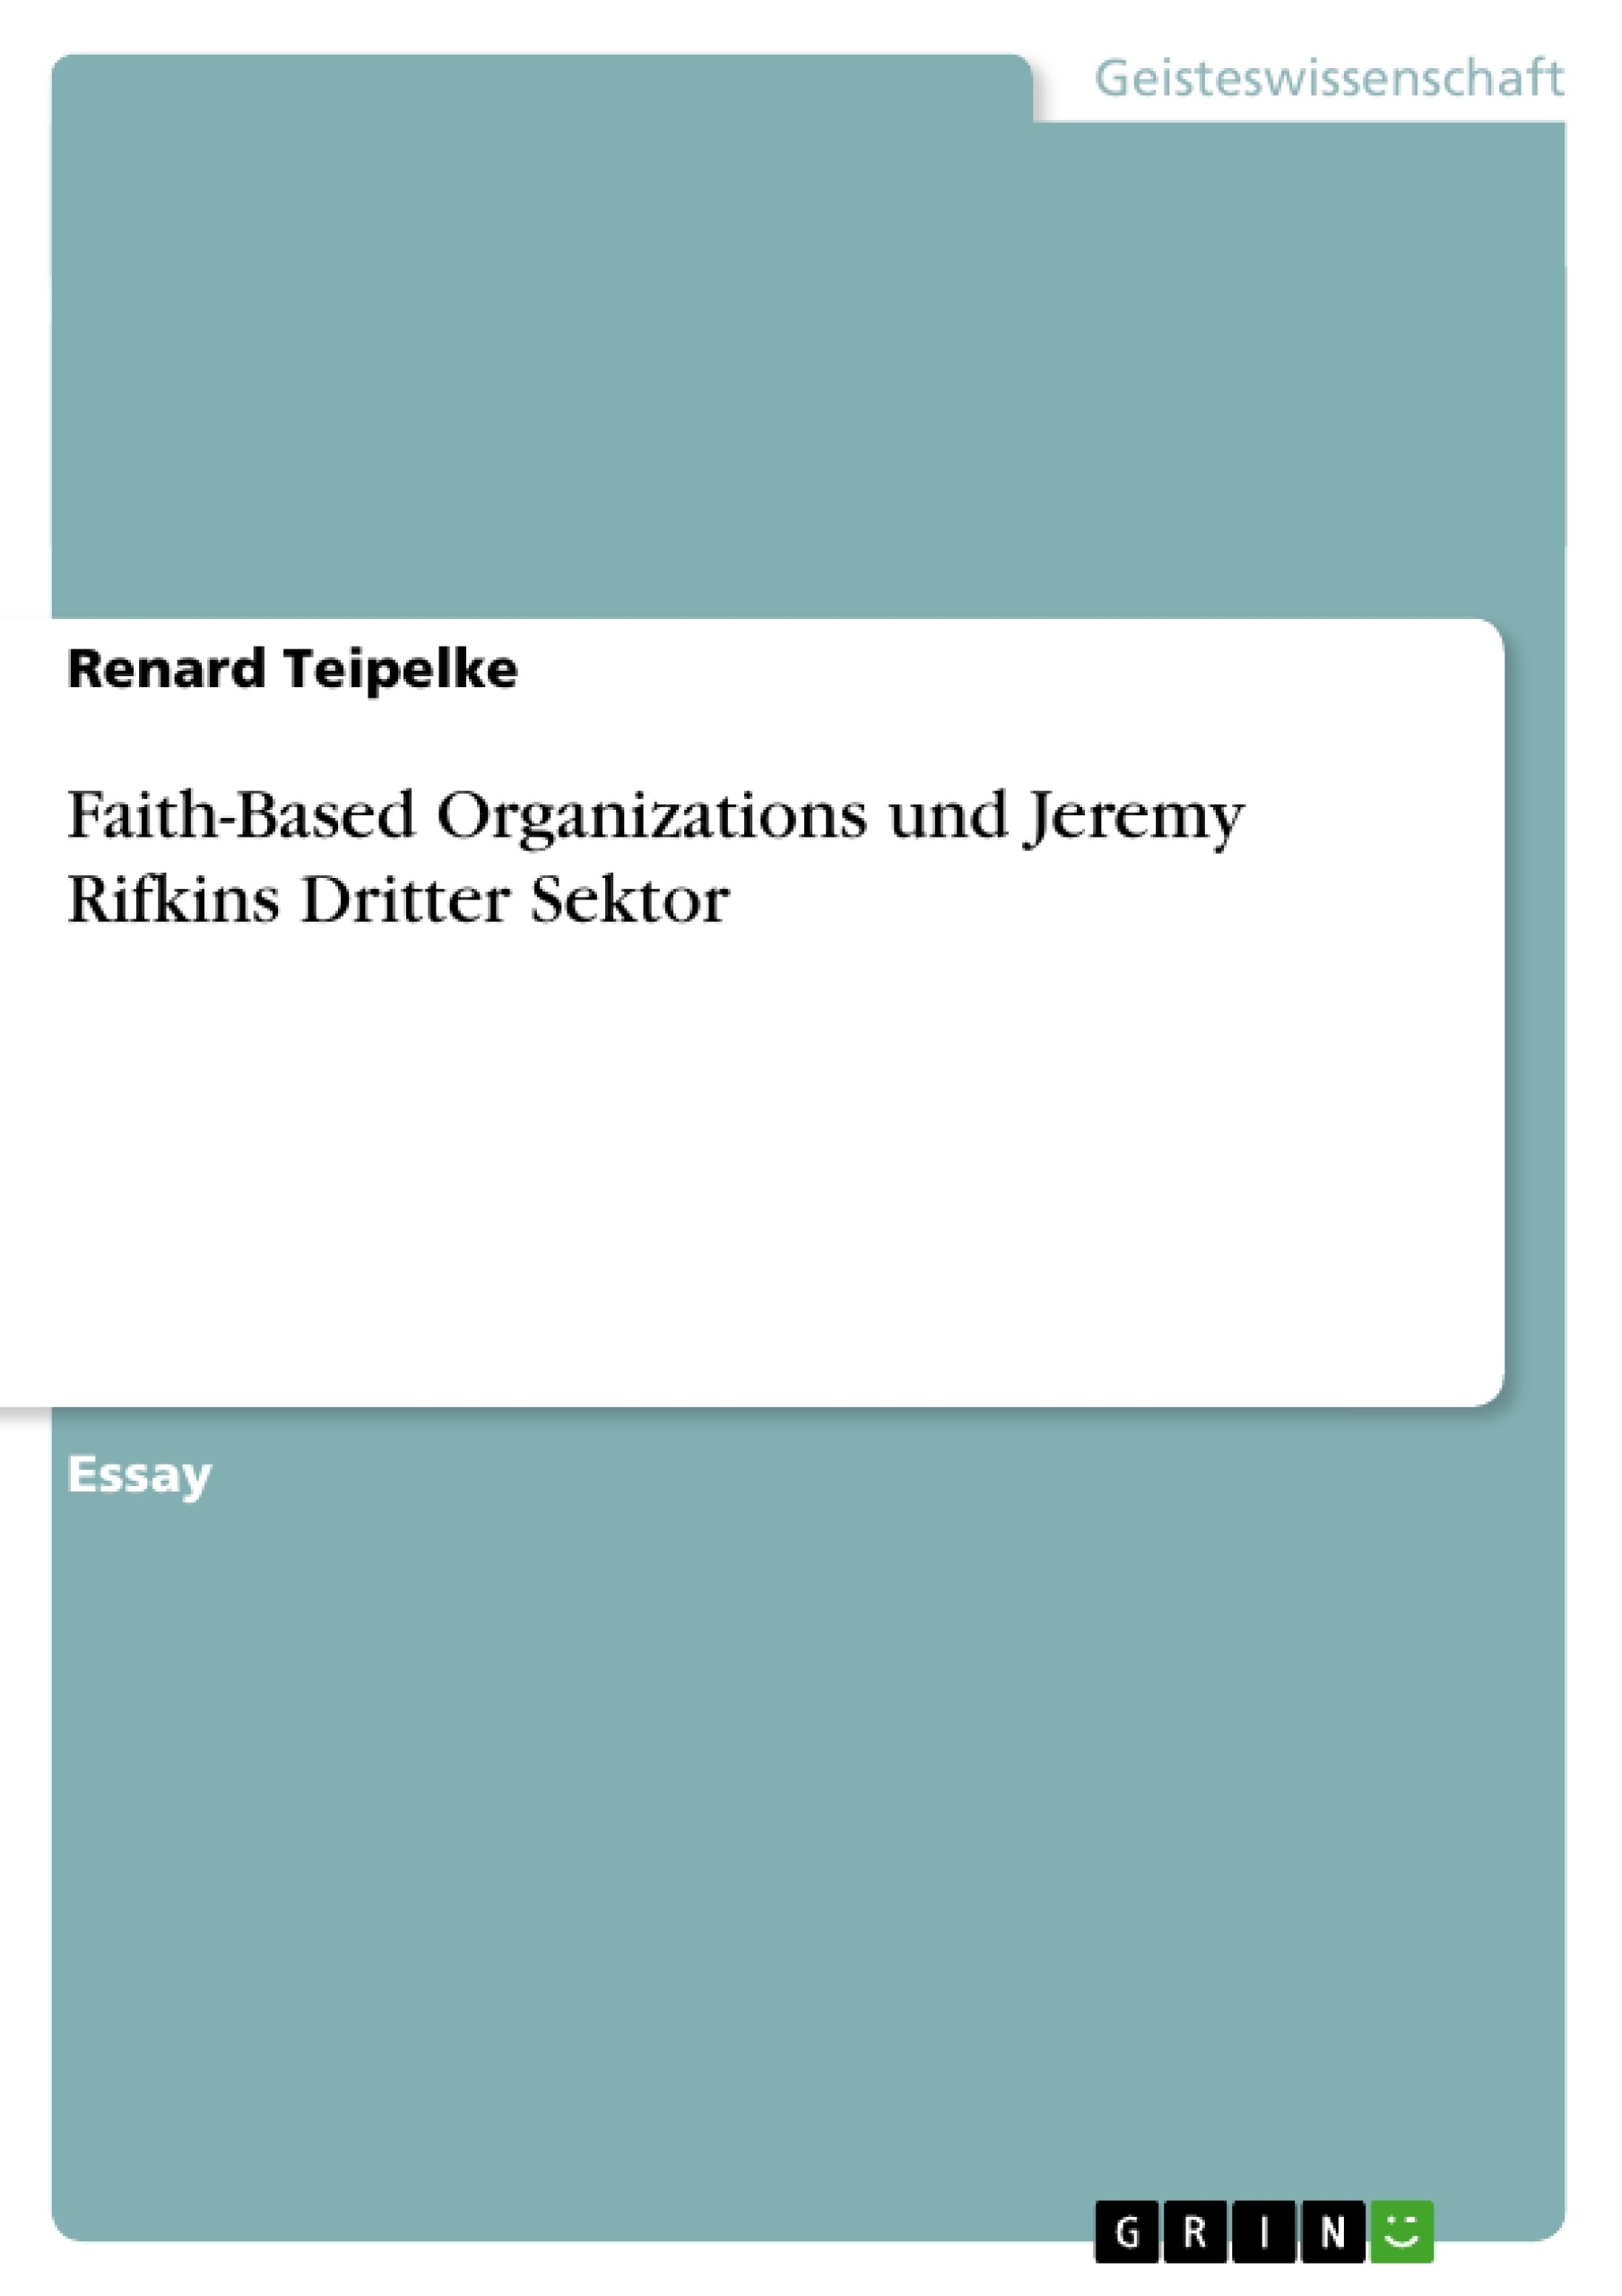 Titel: Faith-Based Organizations und Jeremy Rifkins Dritter Sektor